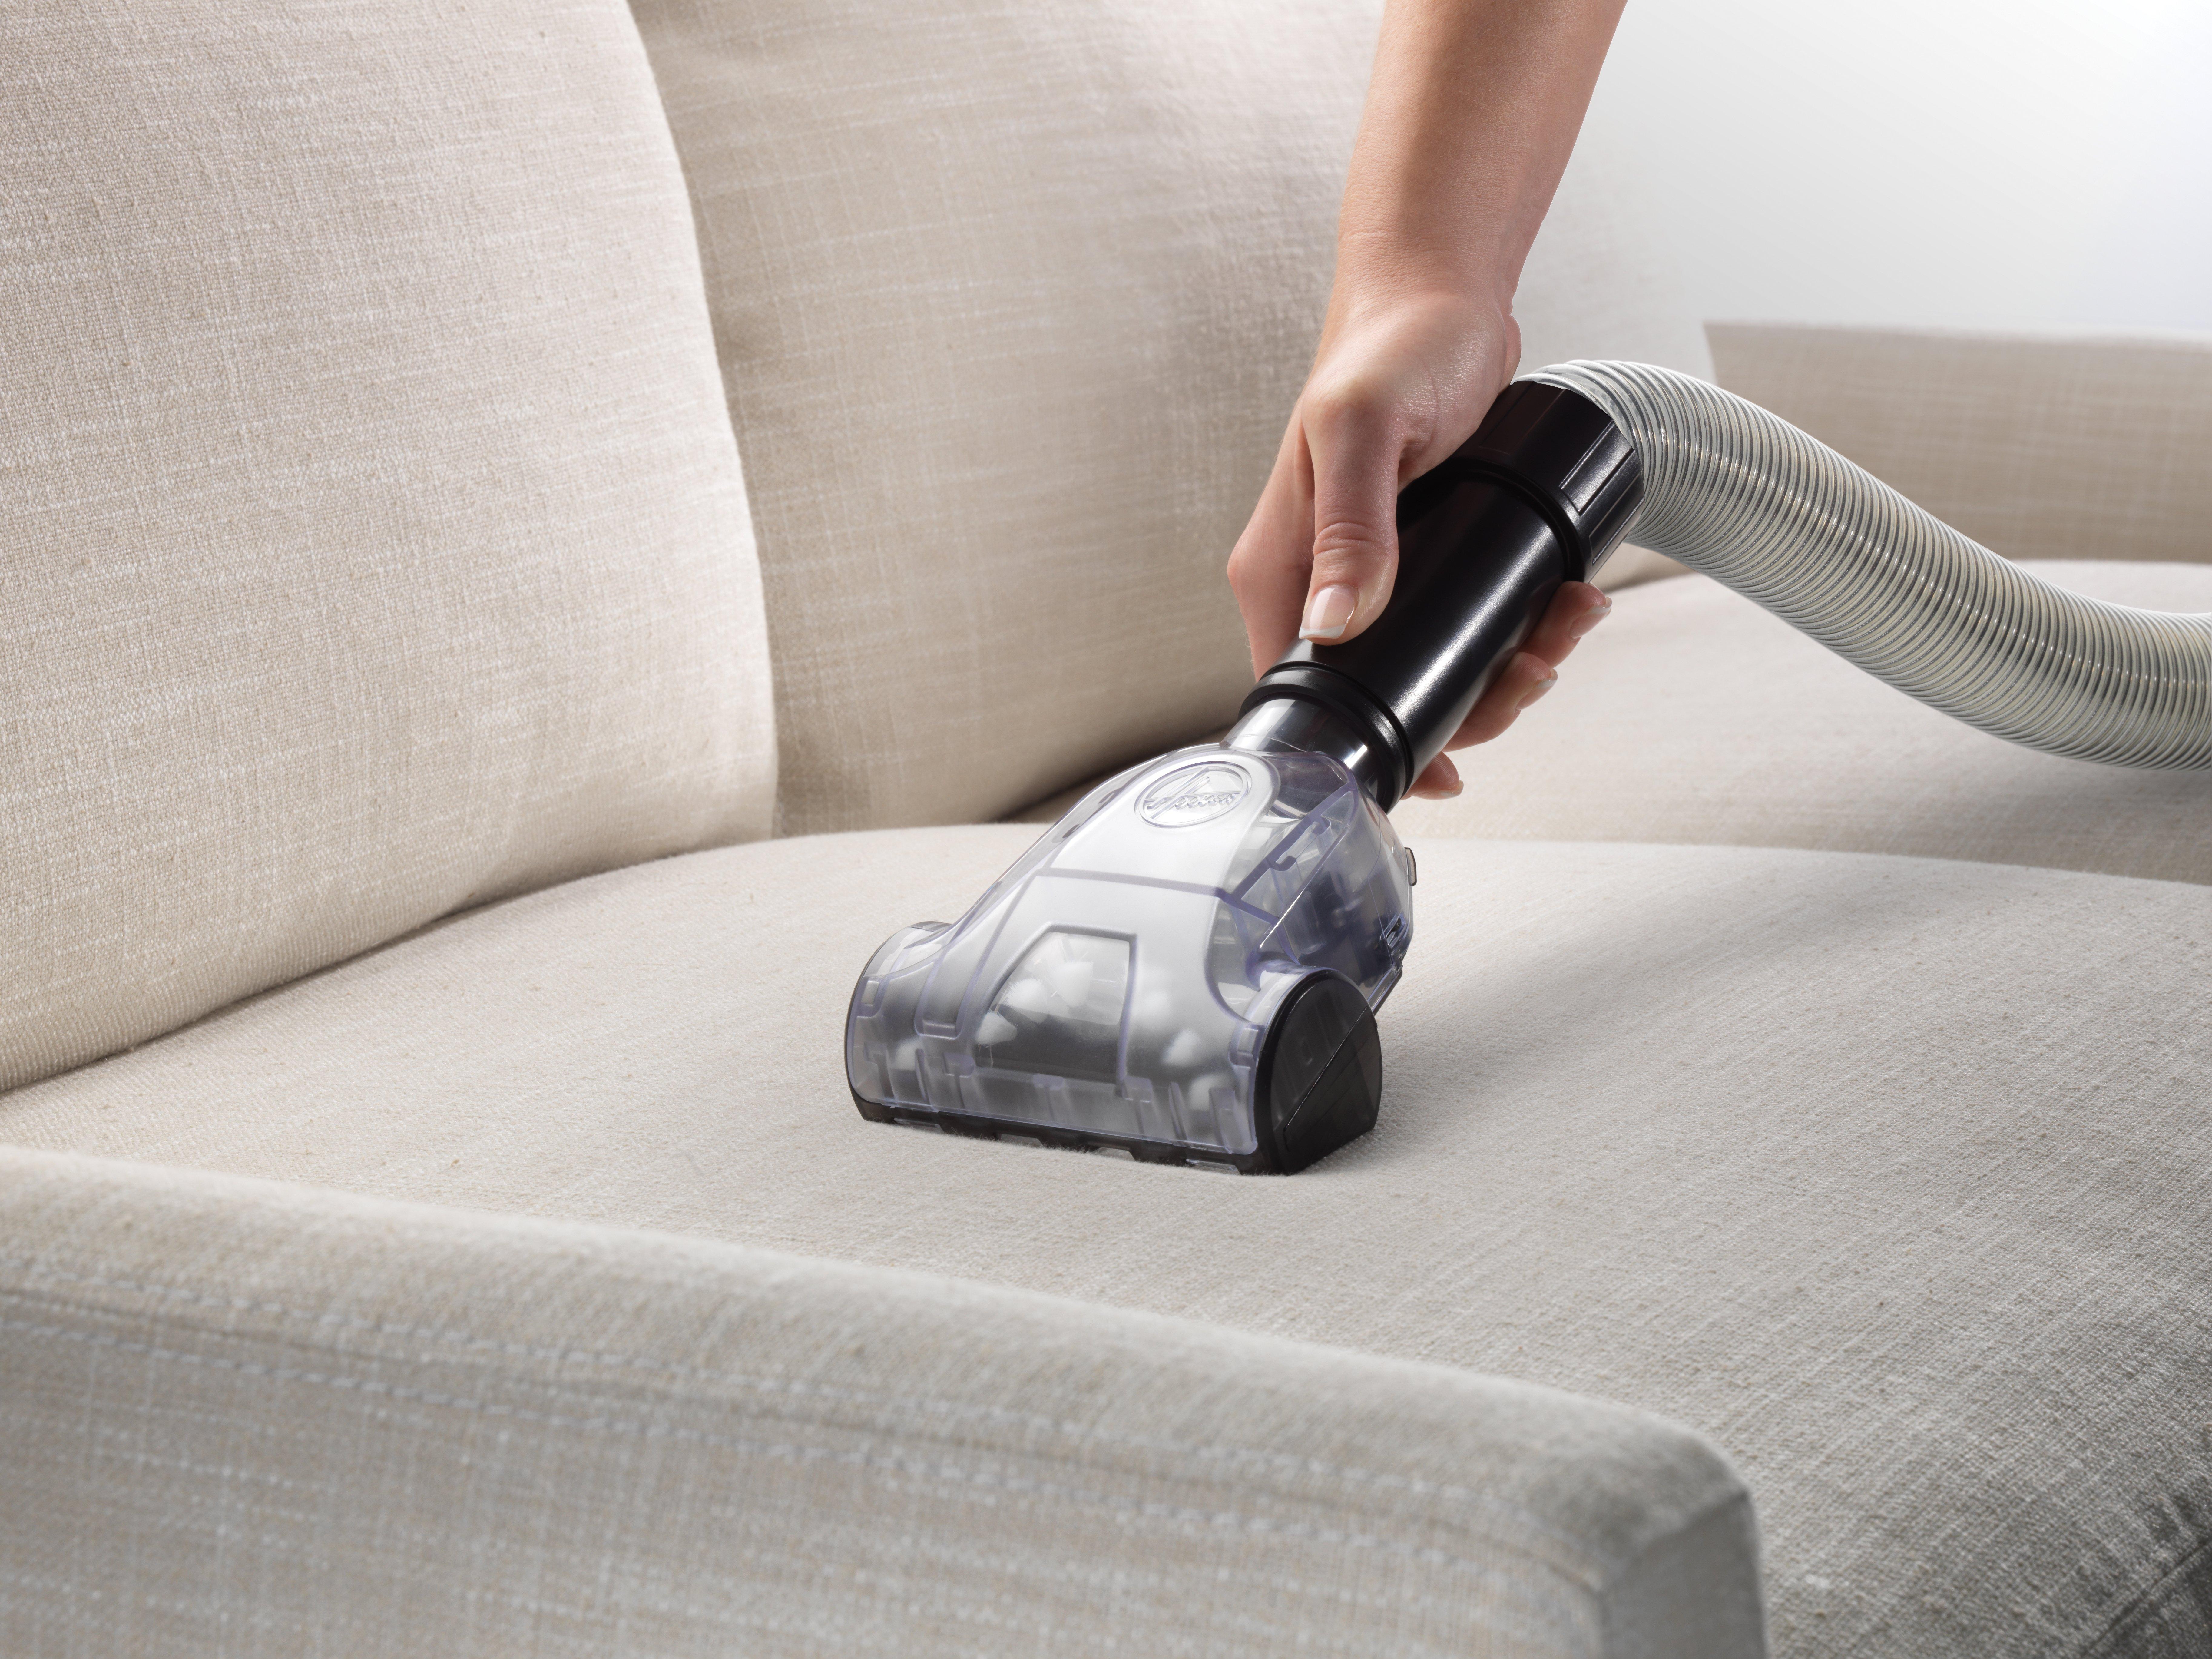 WindTunnel 3 Pro Upright Vacuum4